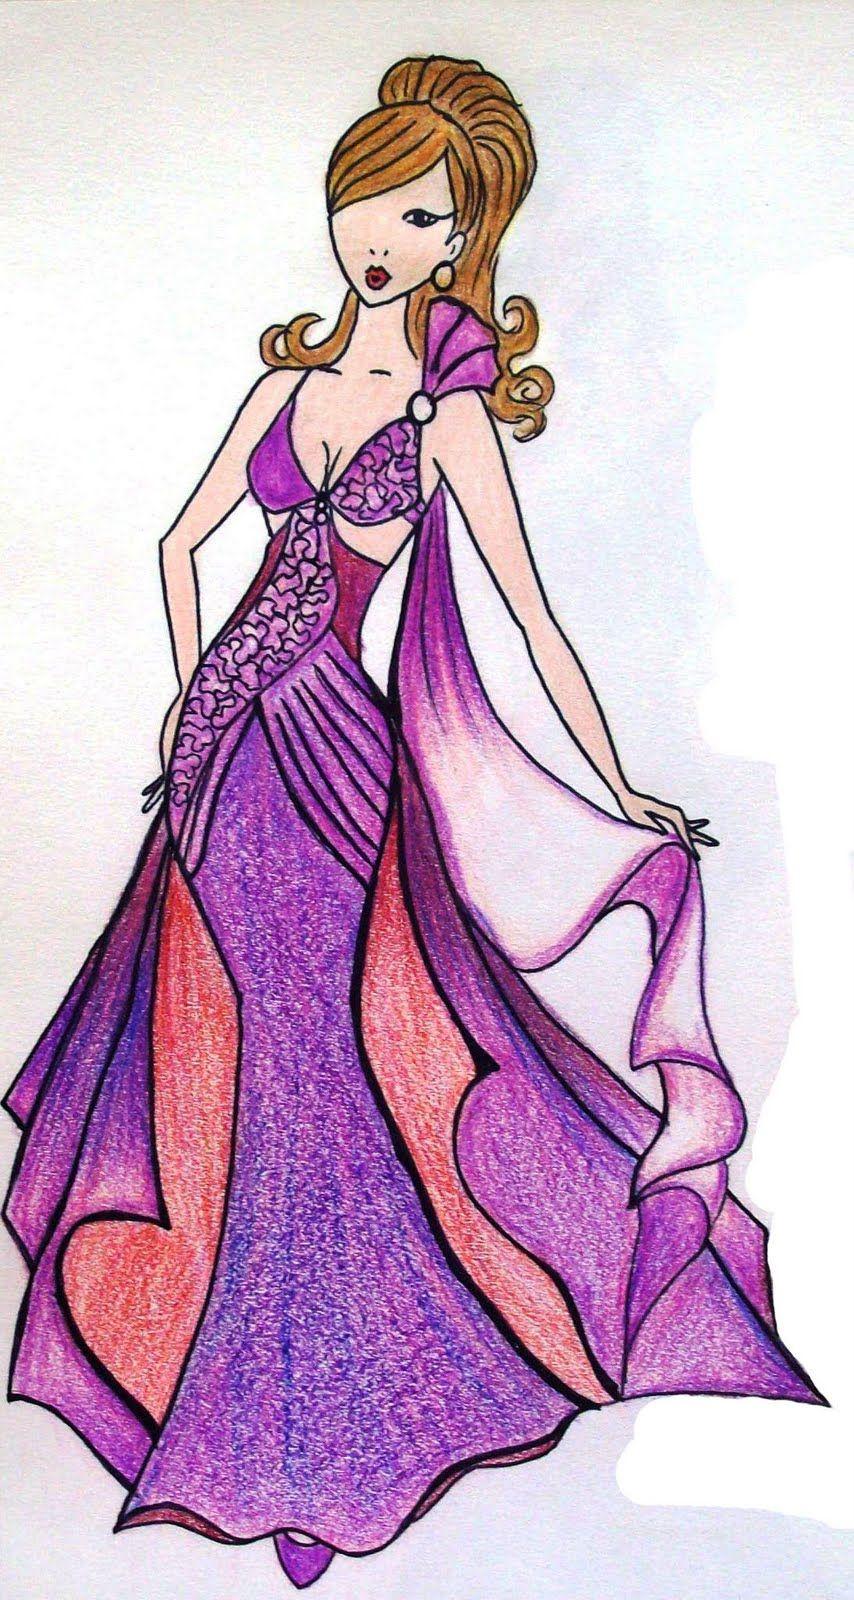 figurines de vestido - Buscar con Google | disenos de moda ...